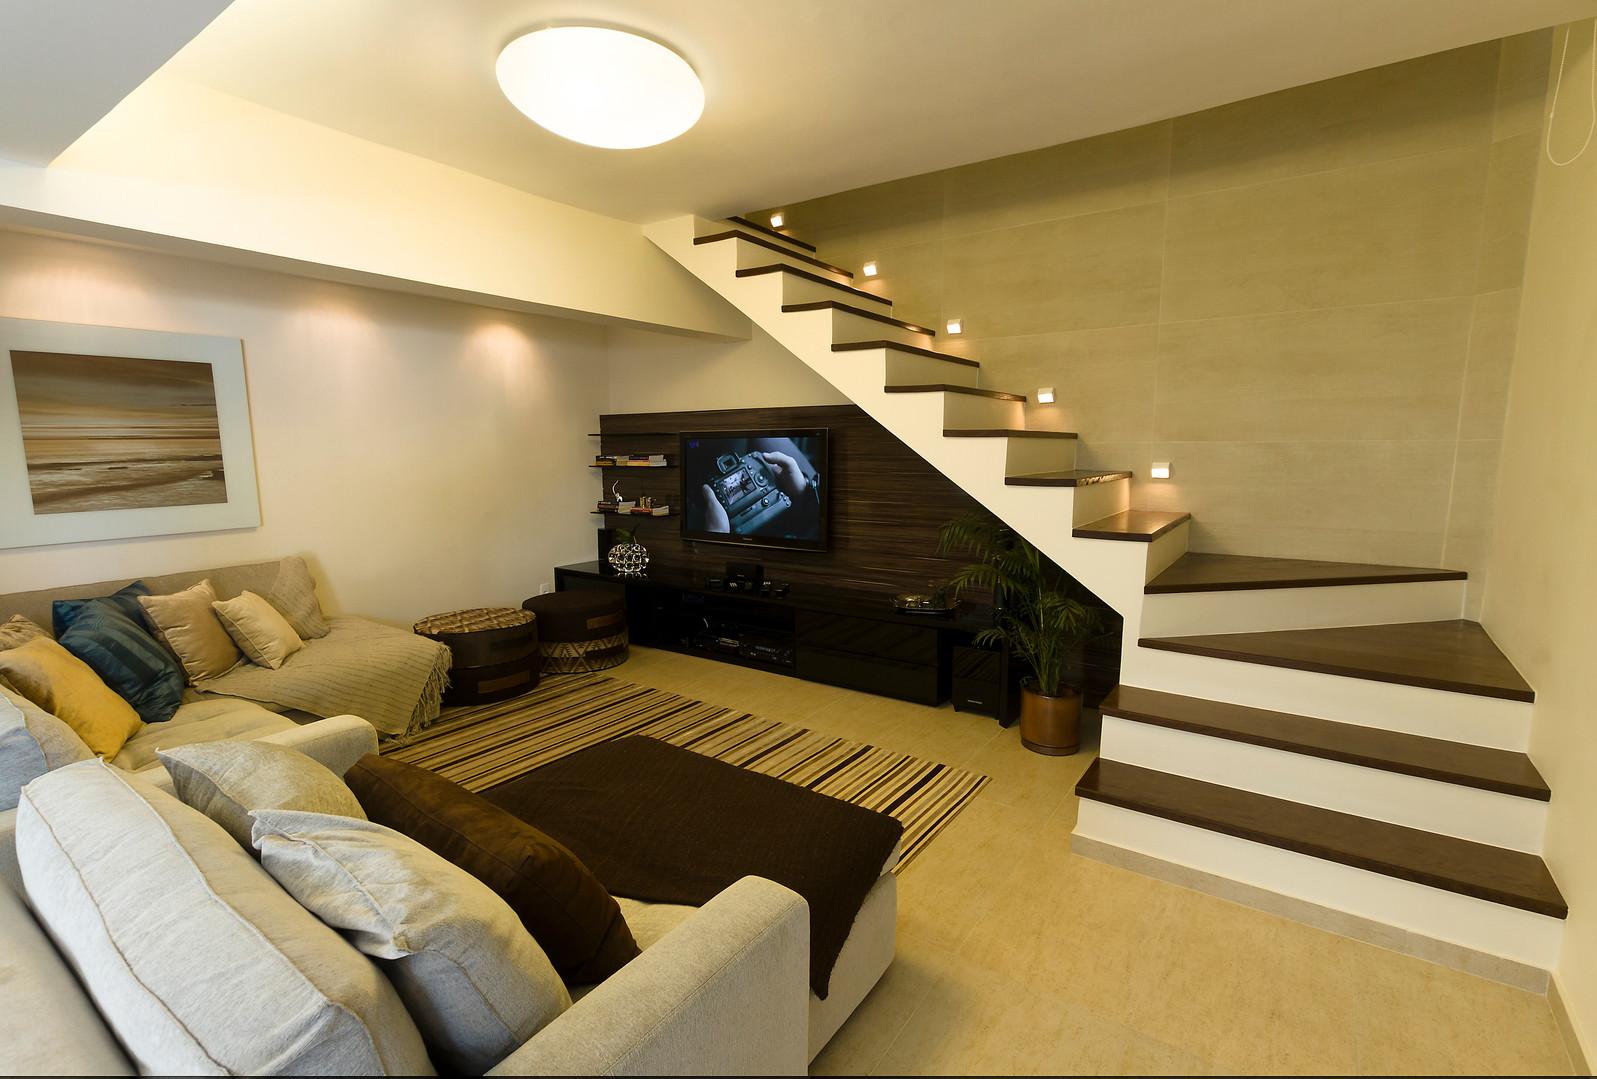 Ana Trevisan Arquitetura Residencial Flo